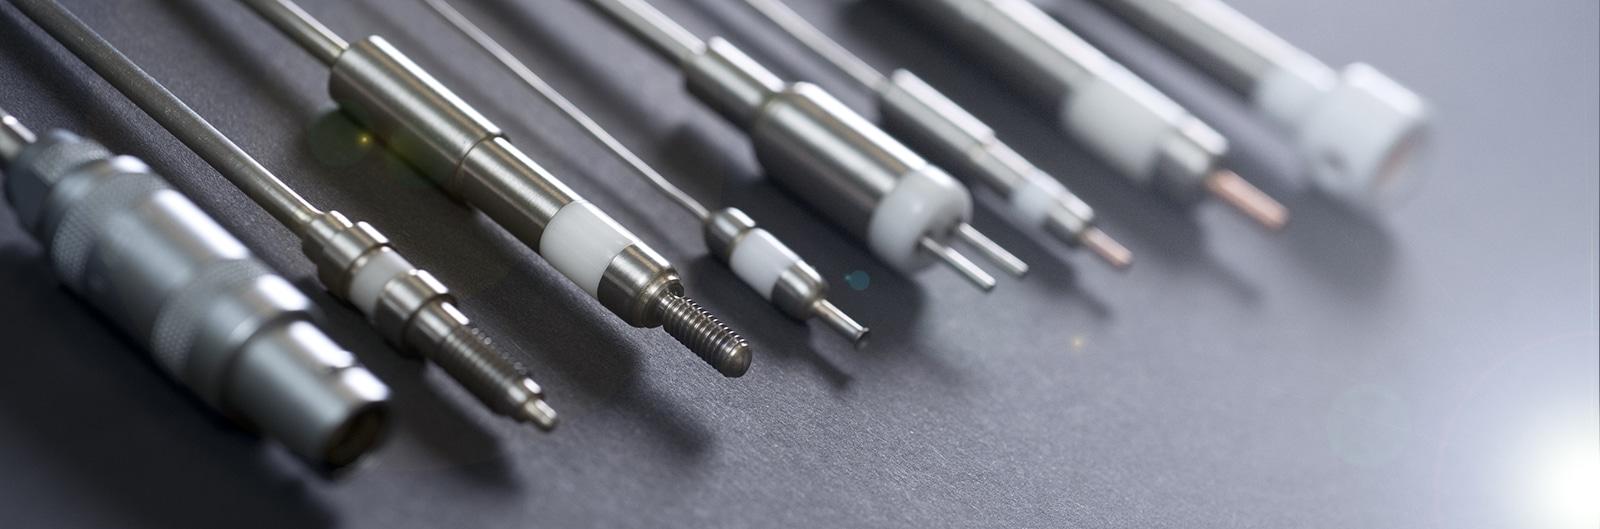 Thermoexpert Deutschland Gmbh Advanced Heating Products